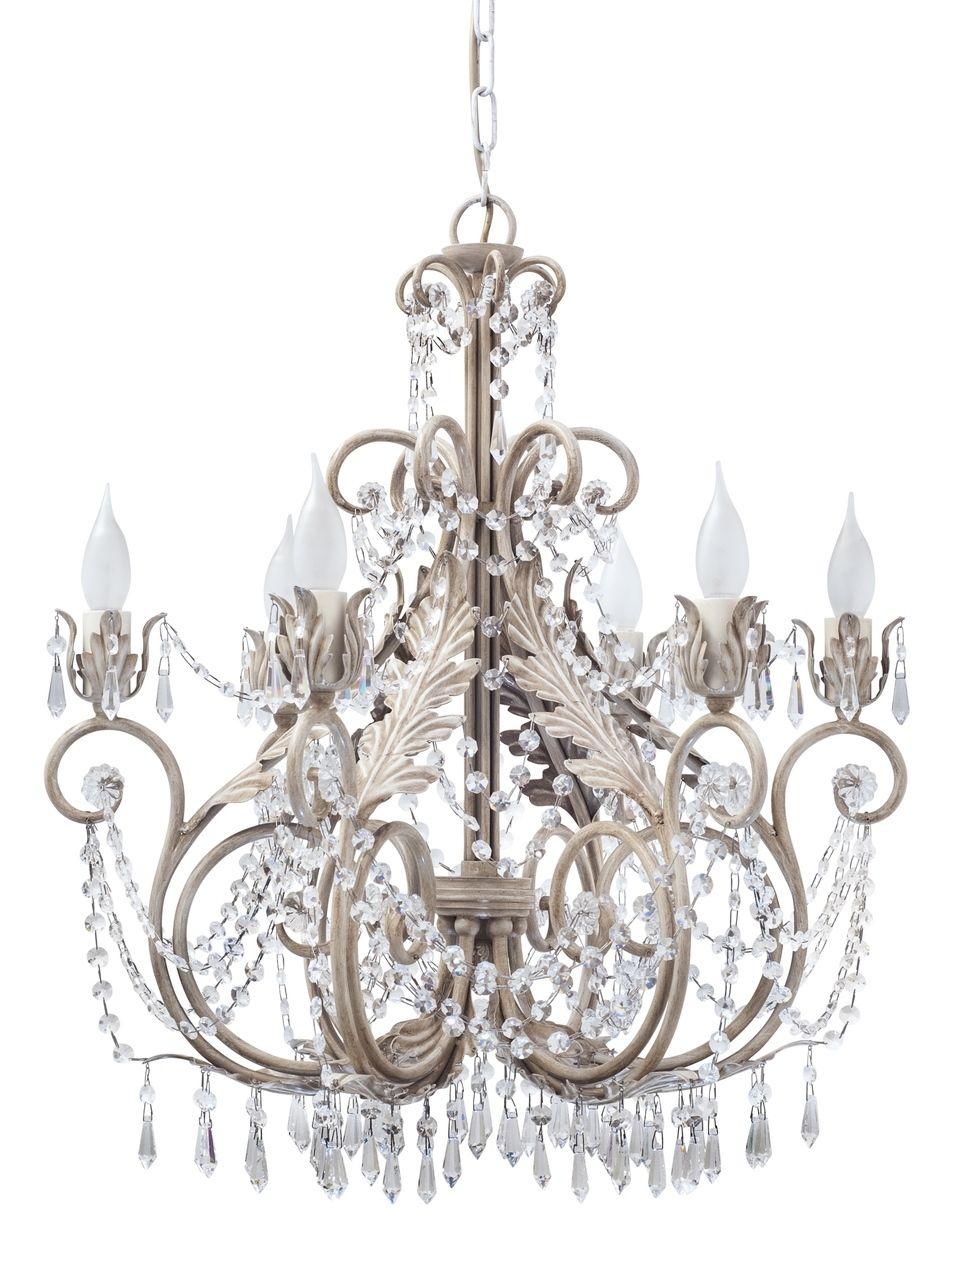 Estense chandeliers crystals beautiful handmade light custom estense chandeliers crystals beautiful handmade light custom elegant arubaitofo Gallery